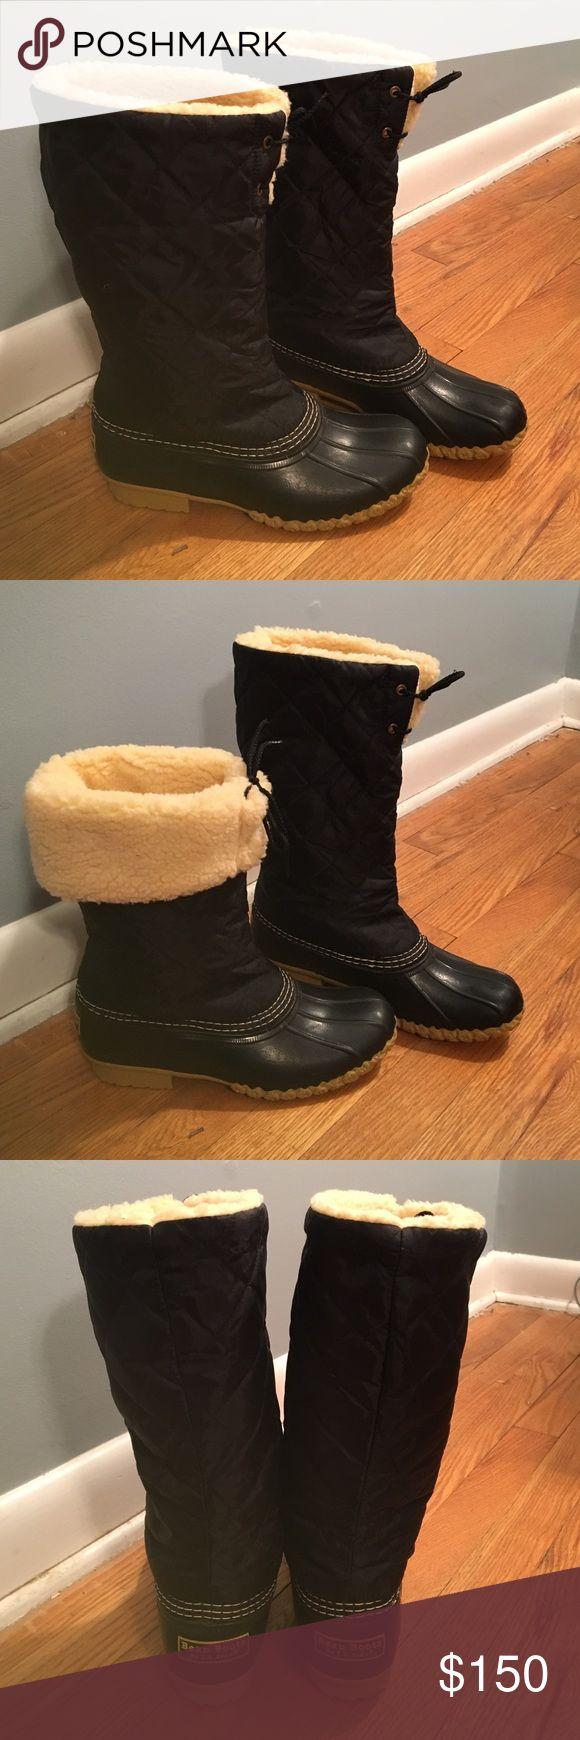 L l bean order form - Women S Black Quilted L L Bean Boots